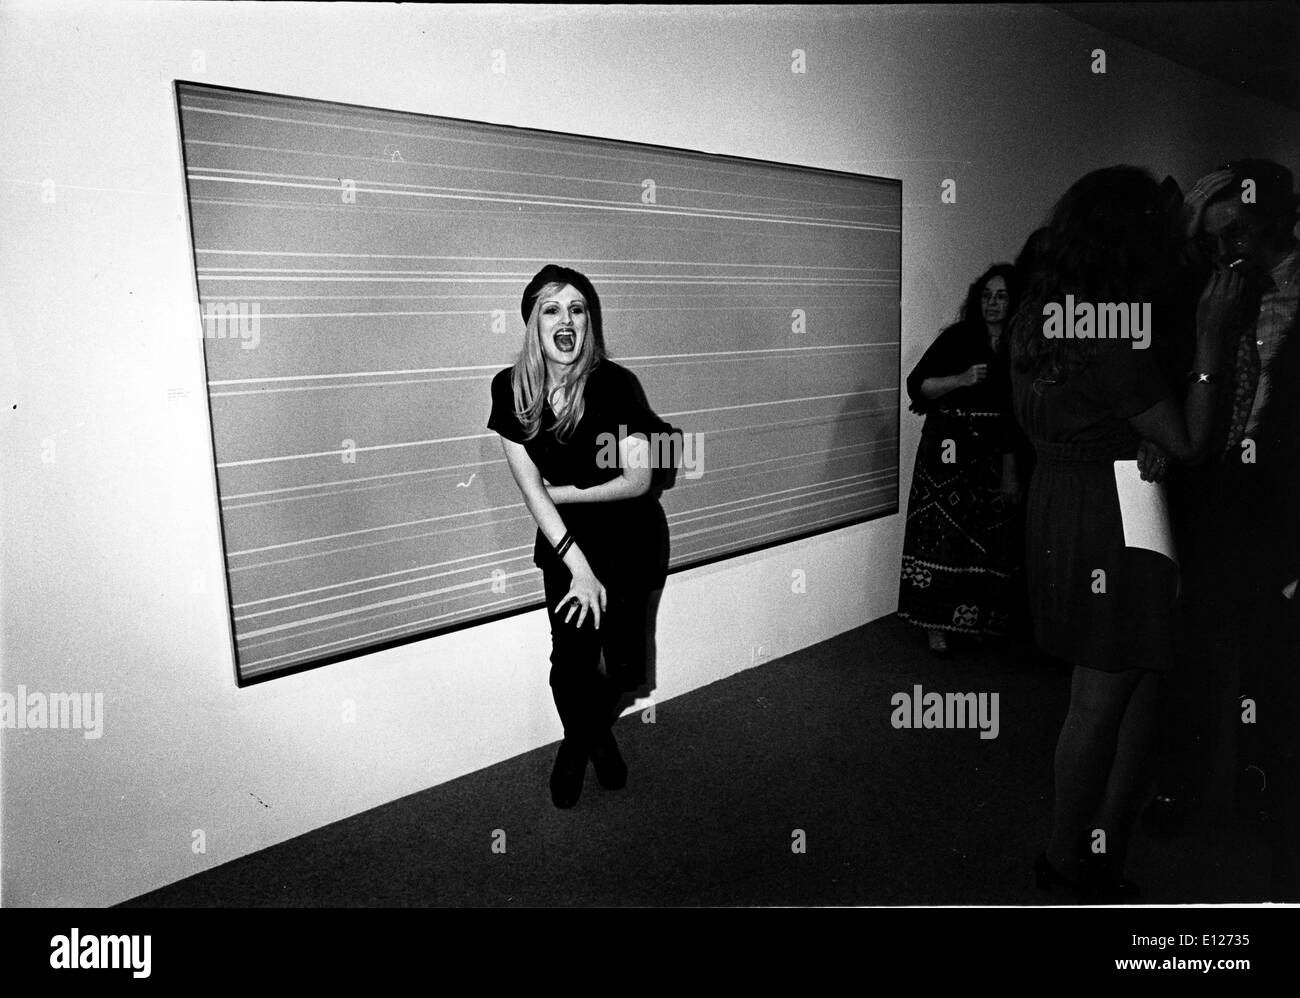 Apr 01, 2009 - London, England, United Kingdom - CANY DARLING - Stock Image